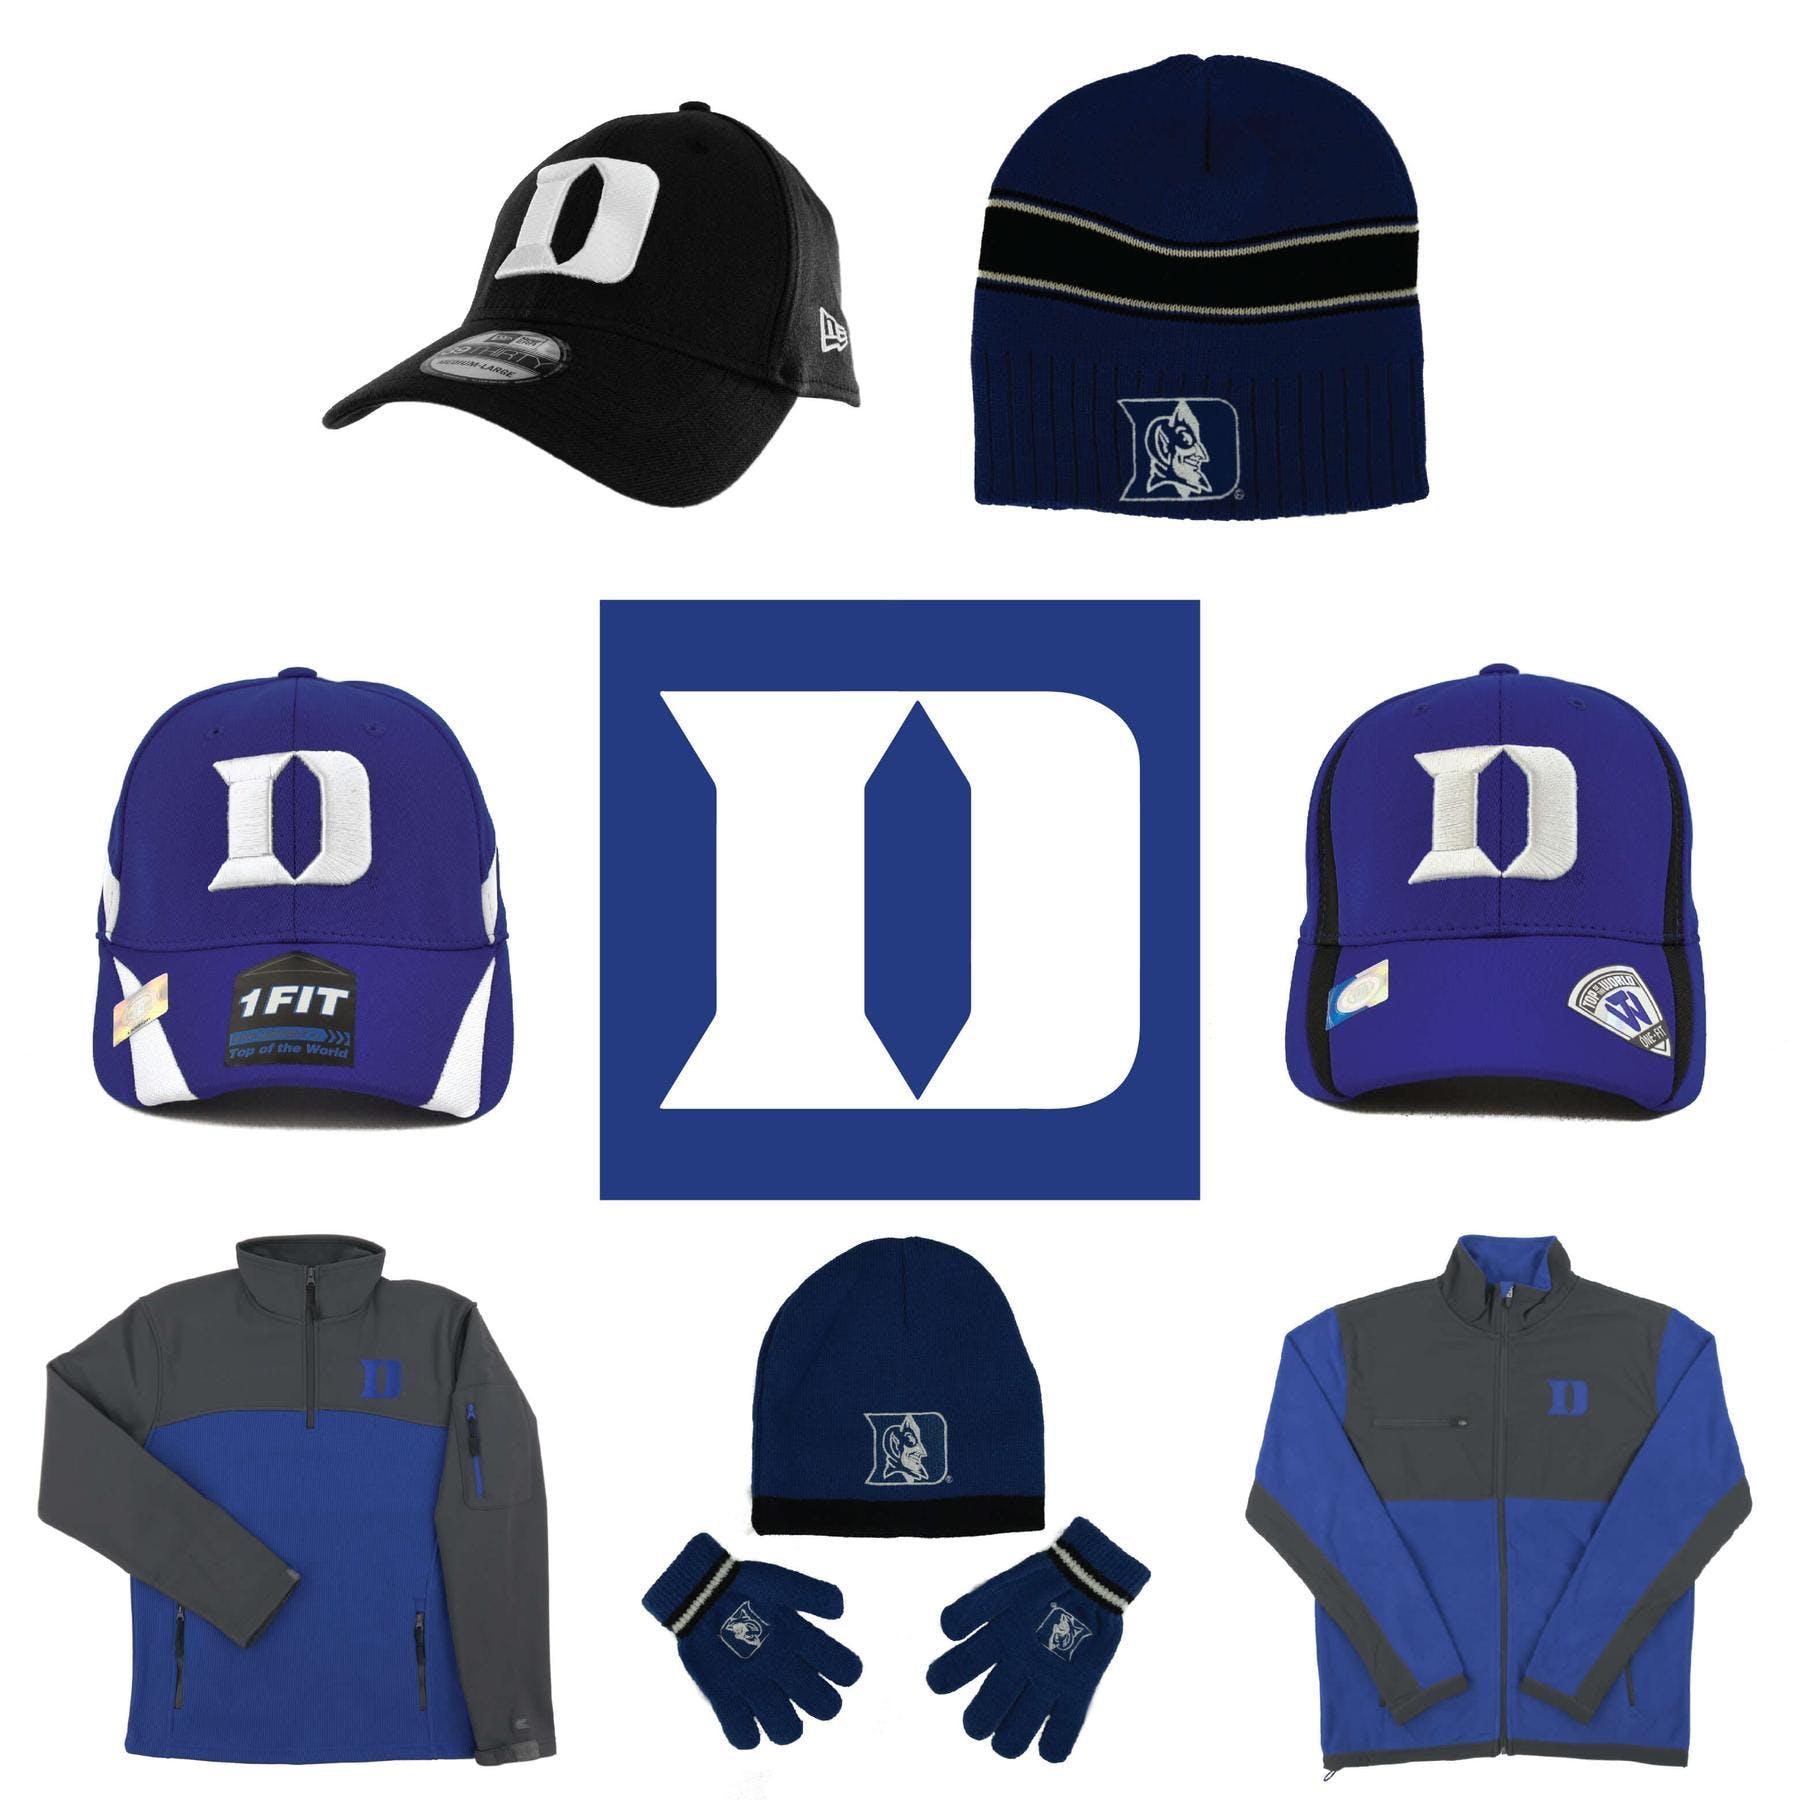 outlet store d6dda 1c397 Duke Blue Devils Officially Licensed NCAA Apparel Liquidation - 300+ Items,  $19,000+ SRP!